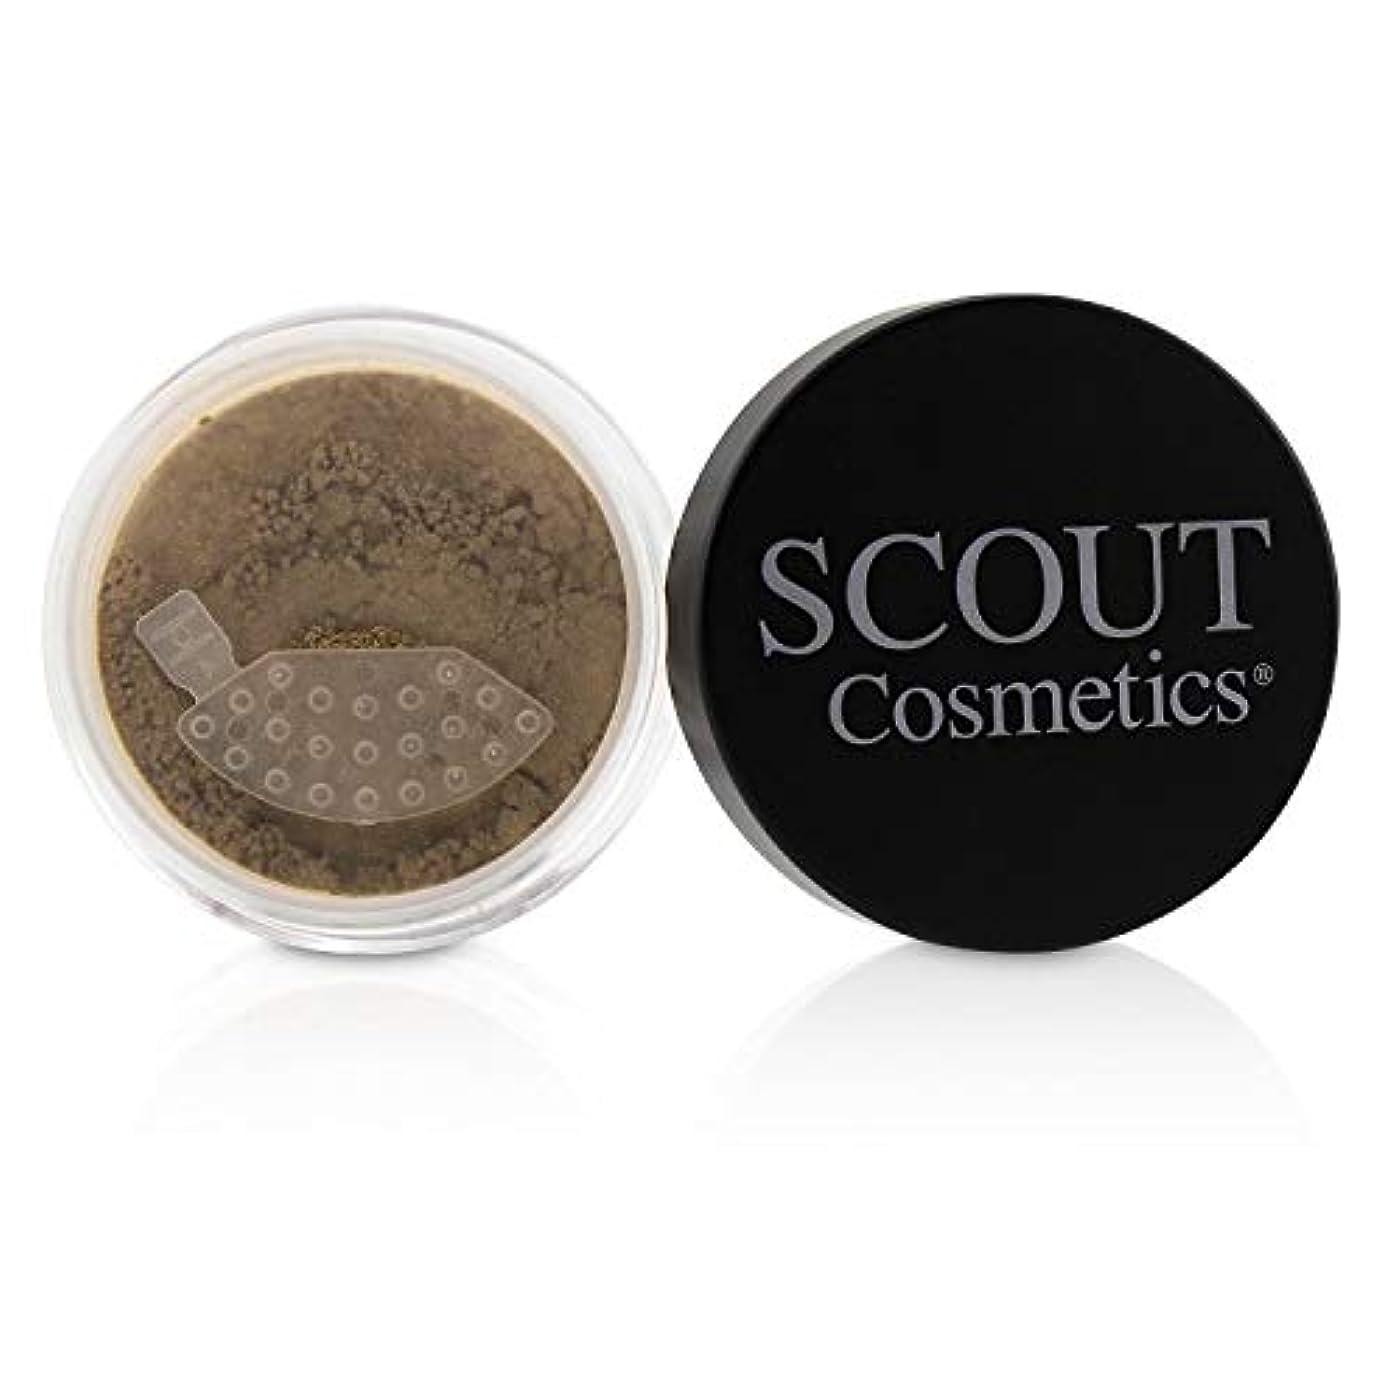 SCOUT Cosmetics Mineral Powder Foundation SPF 20 - # Almond 8g/0.28oz並行輸入品